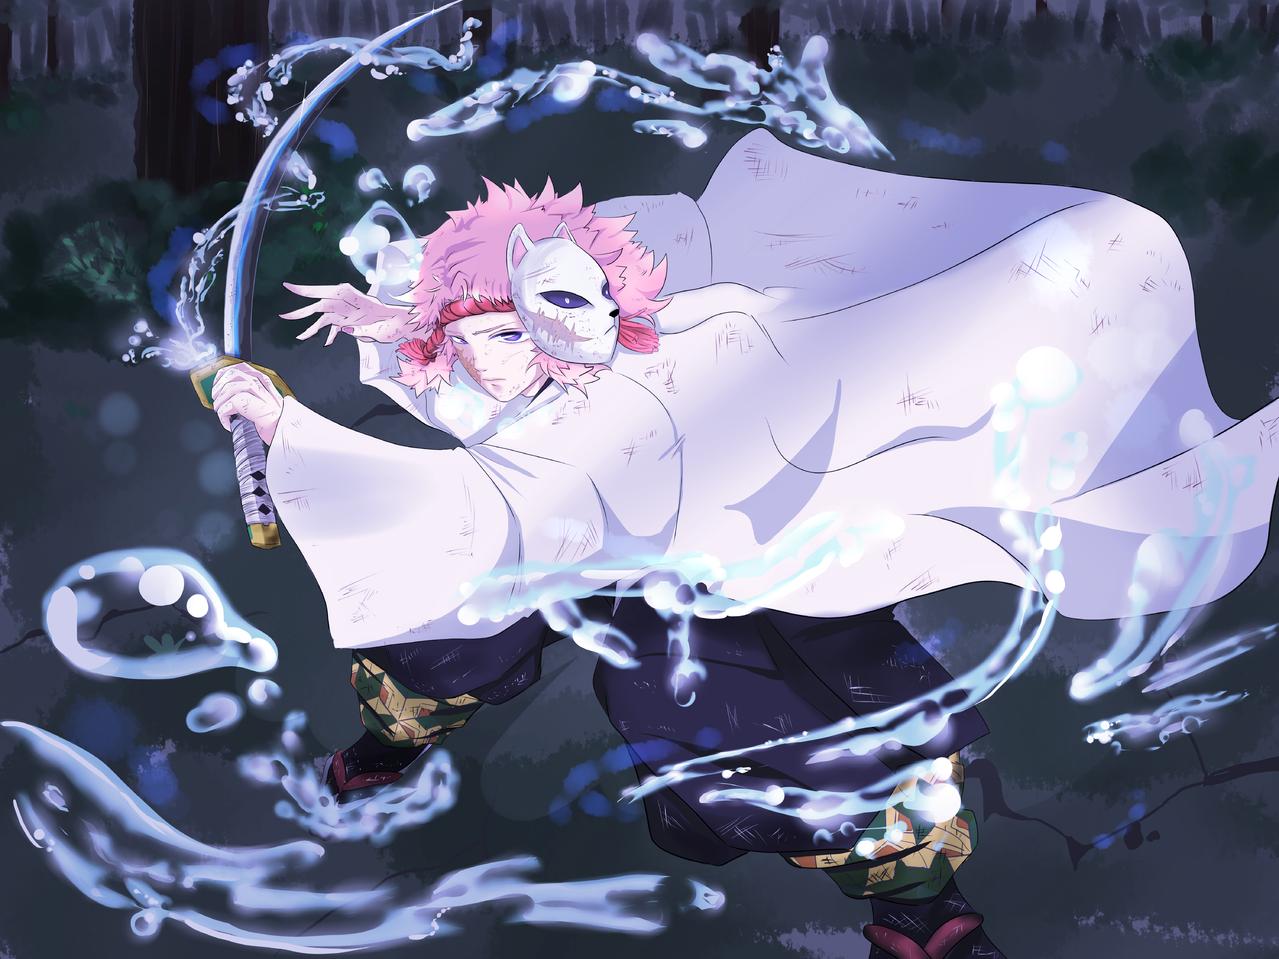 kimetsu no yaiba Illust of seira DemonSlayerFanartContest 錆兎 KimetsunoYaiba FinalSelection sabito